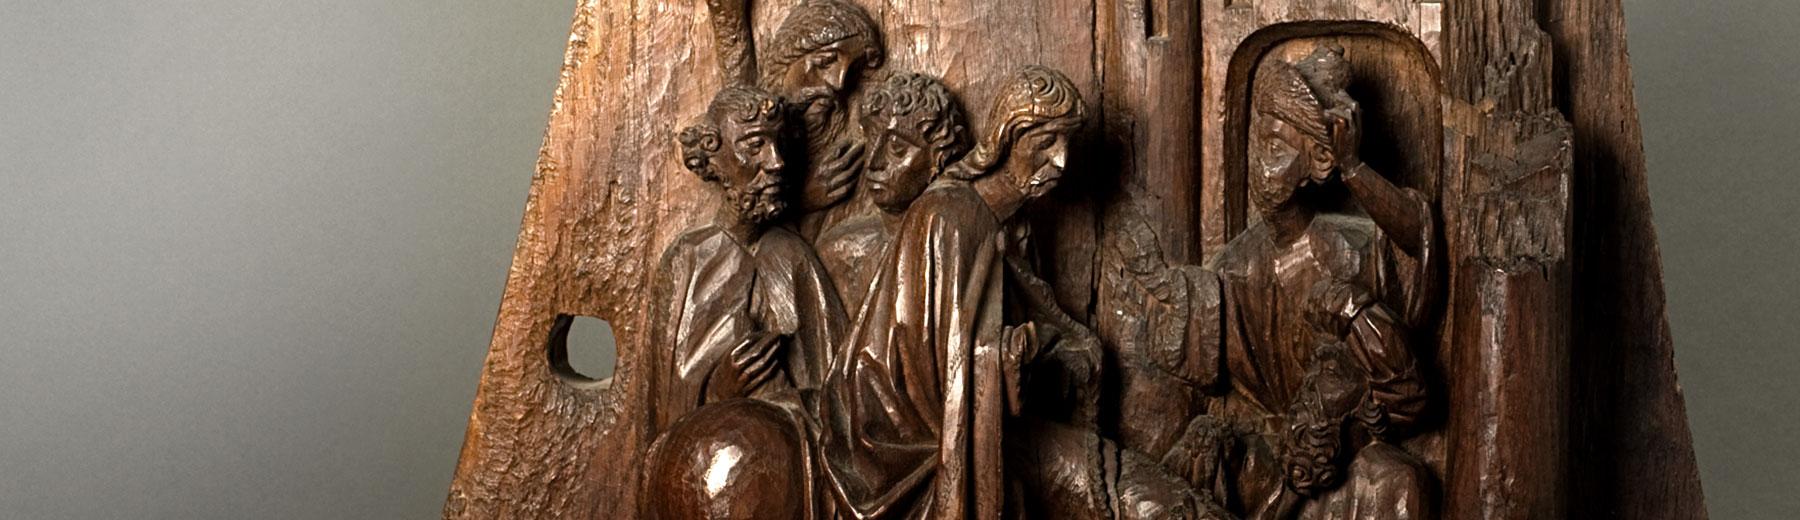 Willem Ards, The entry of Christ in Jerusalem, oak, Leuven, ca. 1448-49(copyright: M - Museum Leuven | photography: Paul Laes)